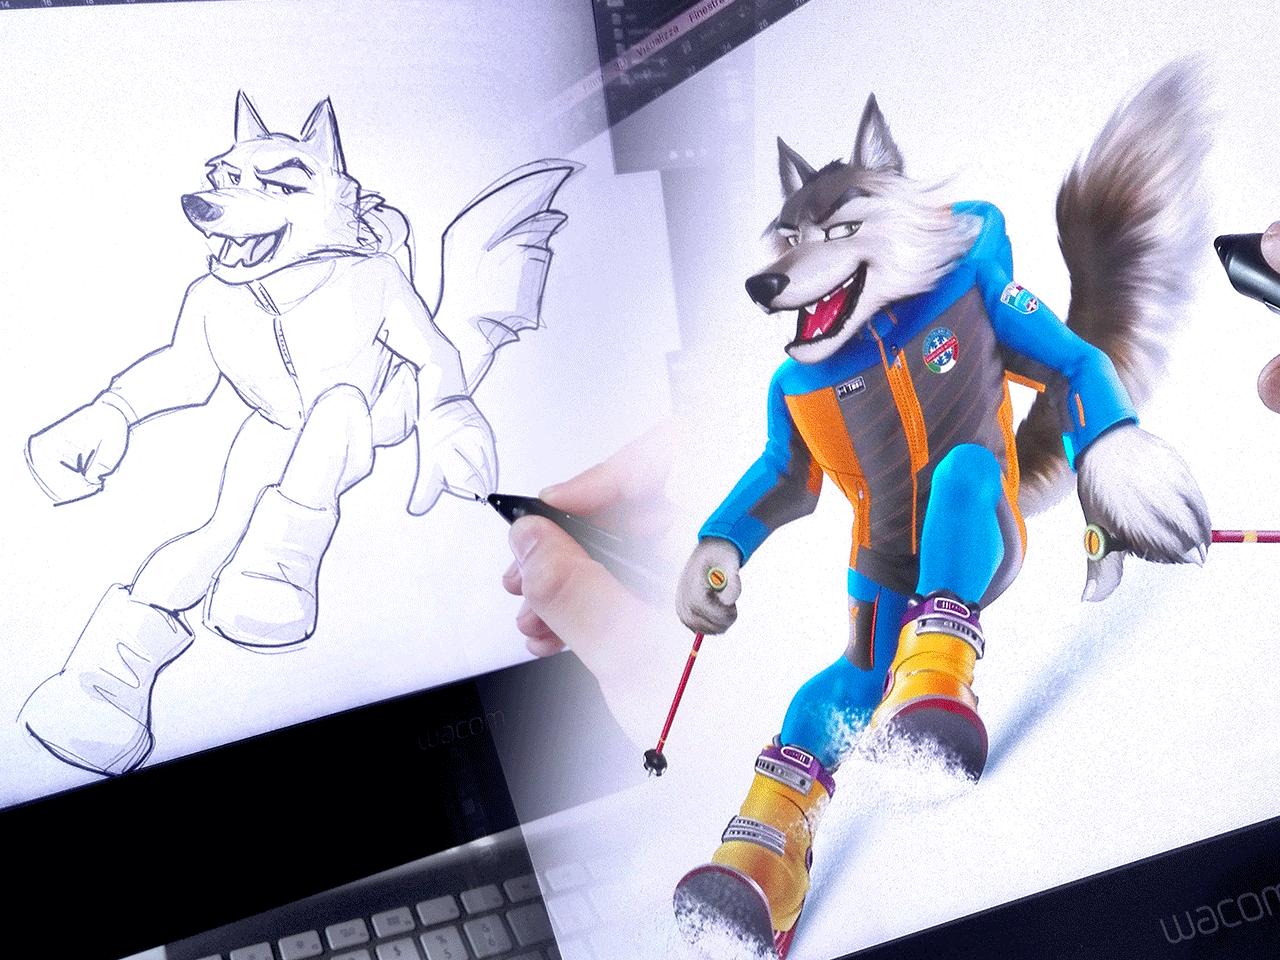 Illustrazioni, studio mascotte e characters